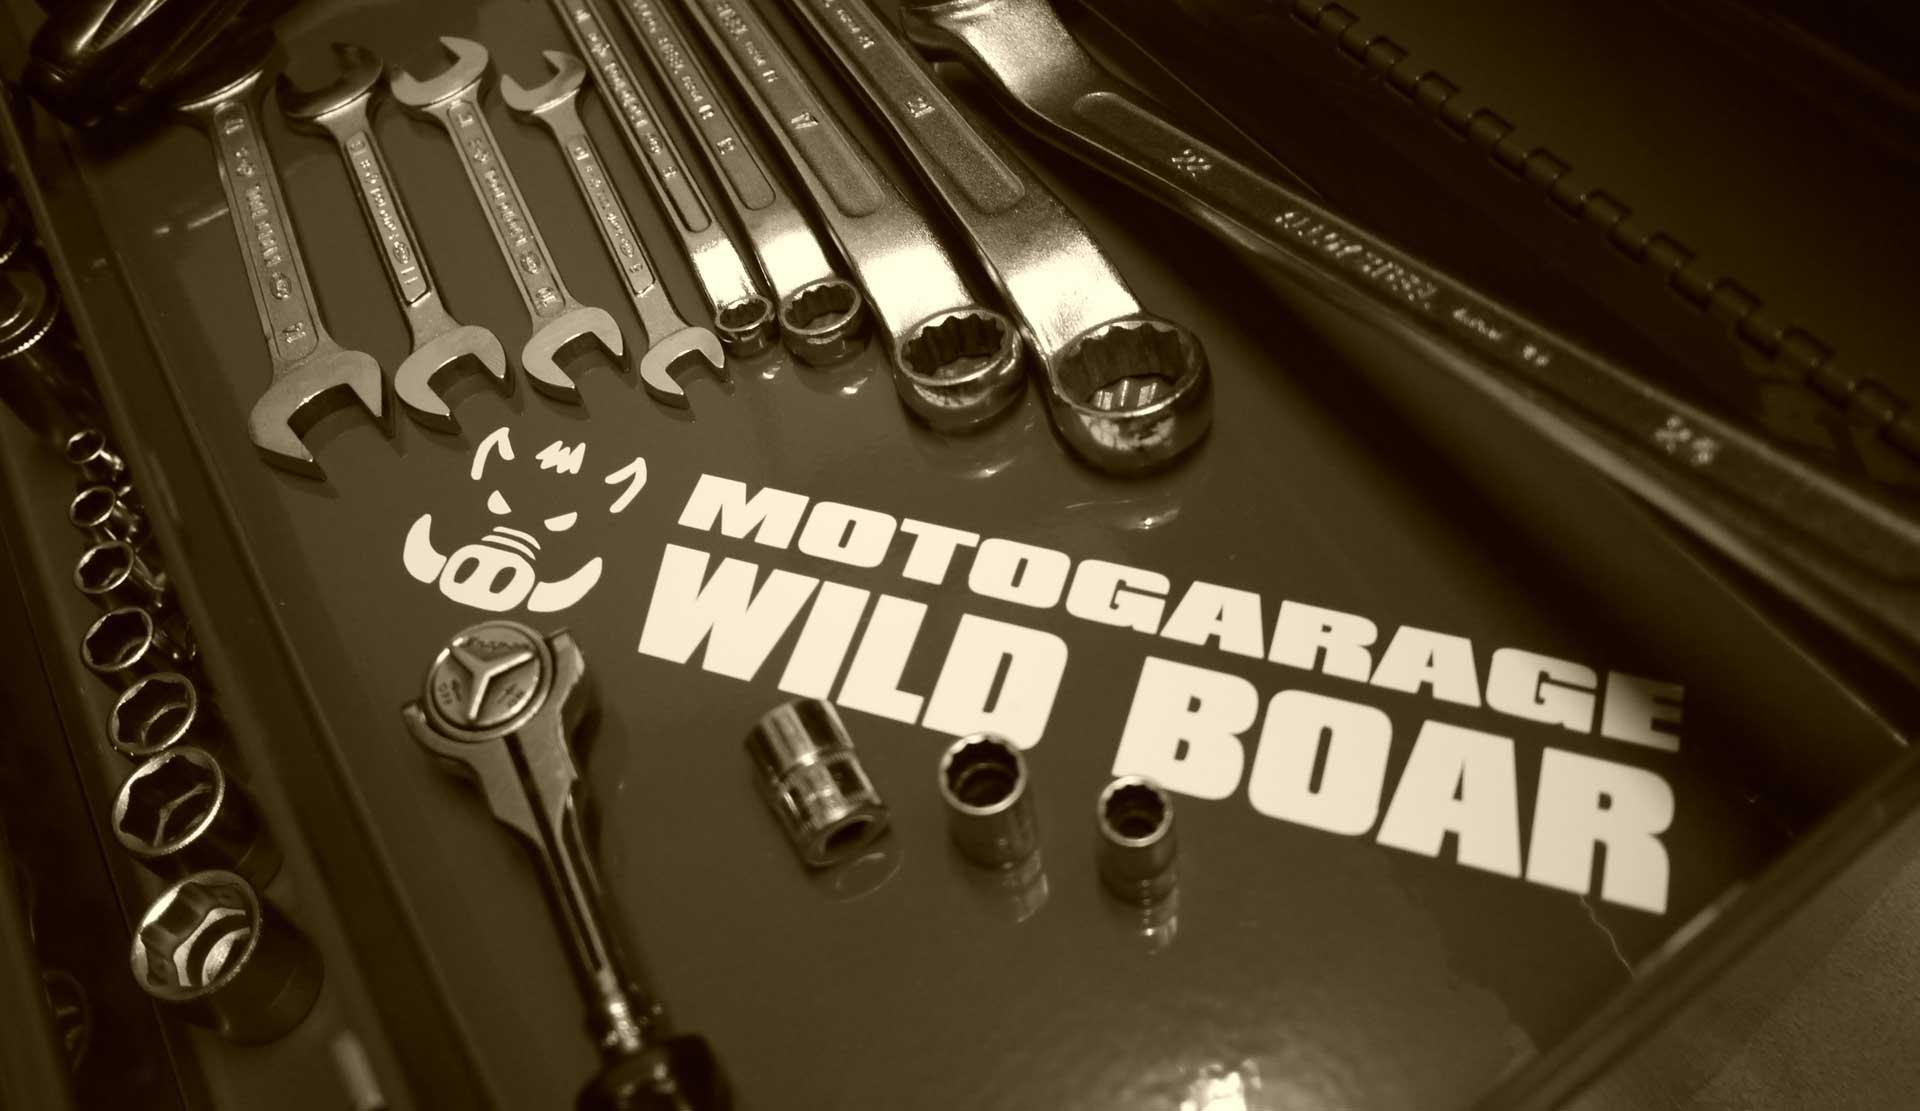 MOTOGARAGE WILD BOAR